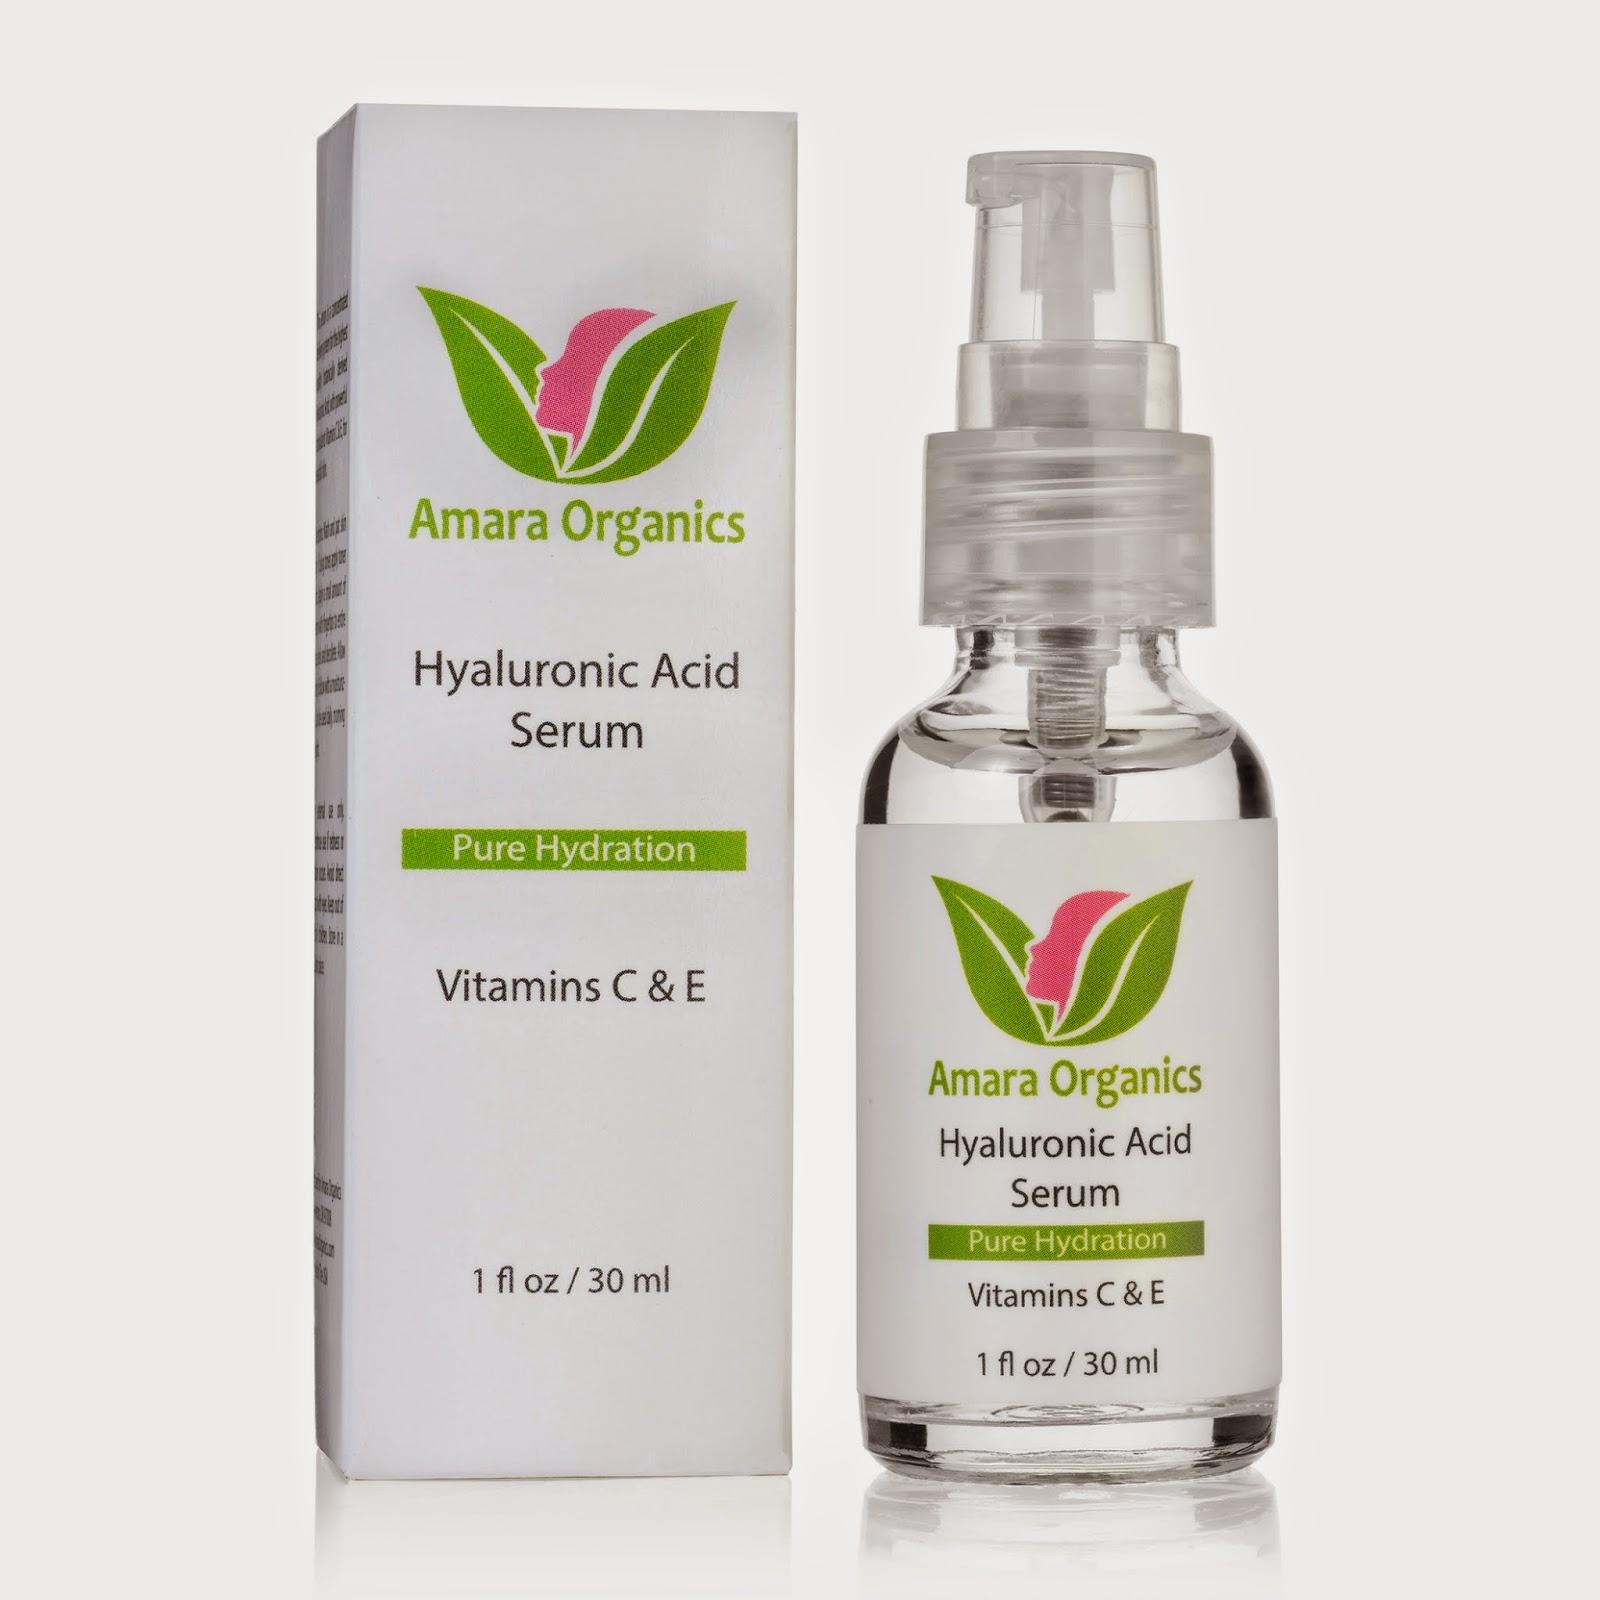 http://www.amazon.com/hyaluronic-acid-serum-skin-moisturizer/dp/b00kb9q8gu